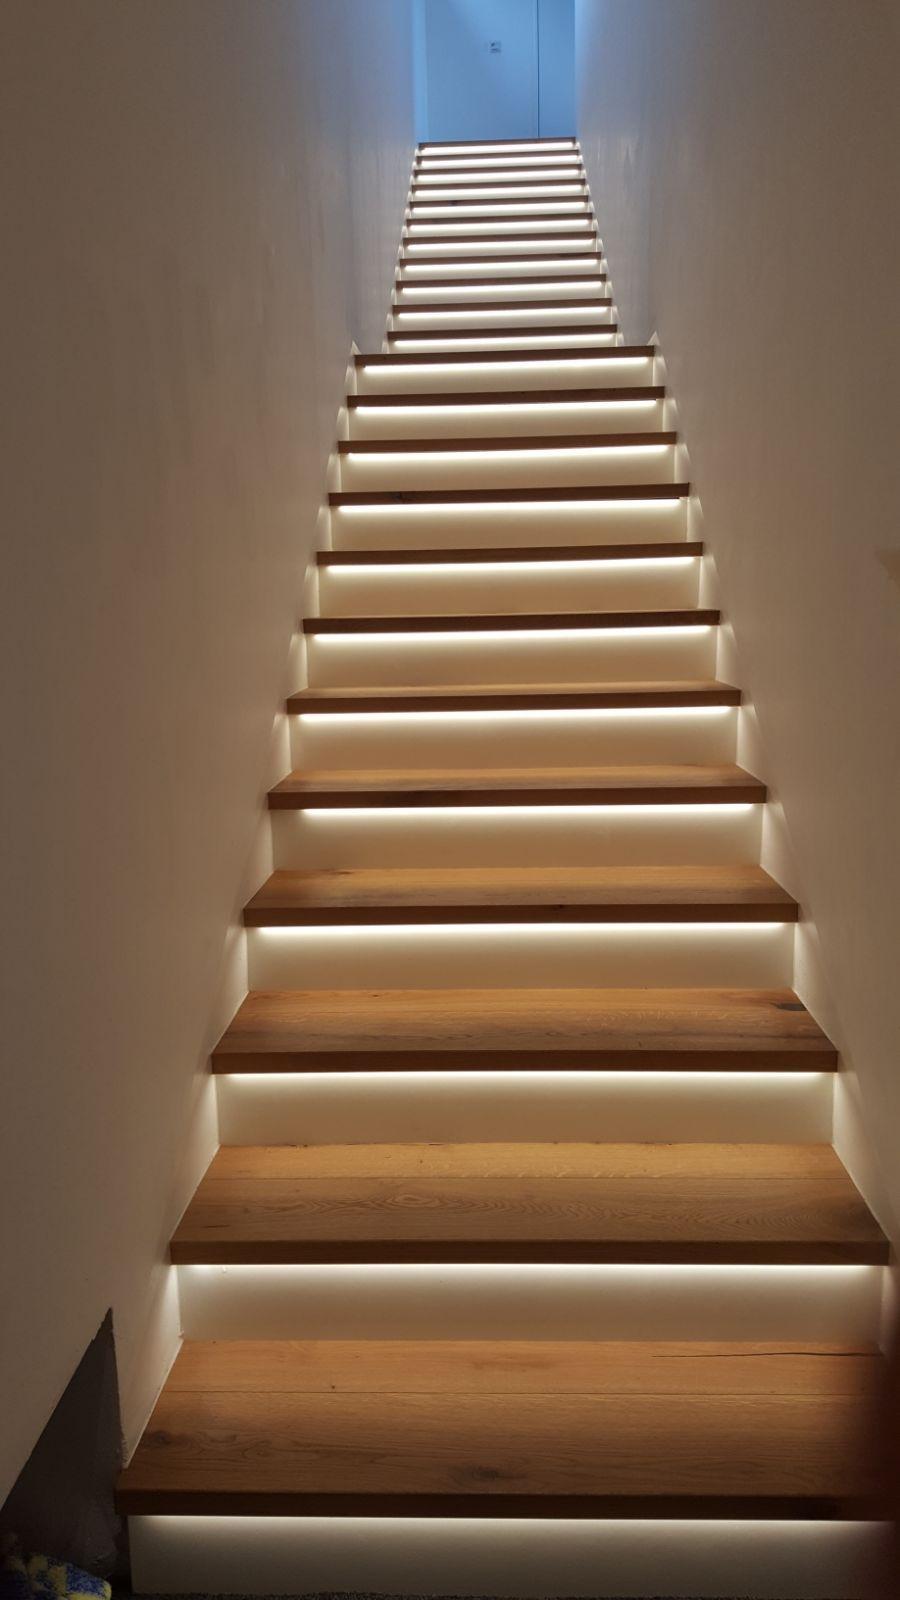 Beleuchtung Der Treppe In 2020 Treppenbeleuchtung Treppenhaus Beleuchtung Treppe Haus